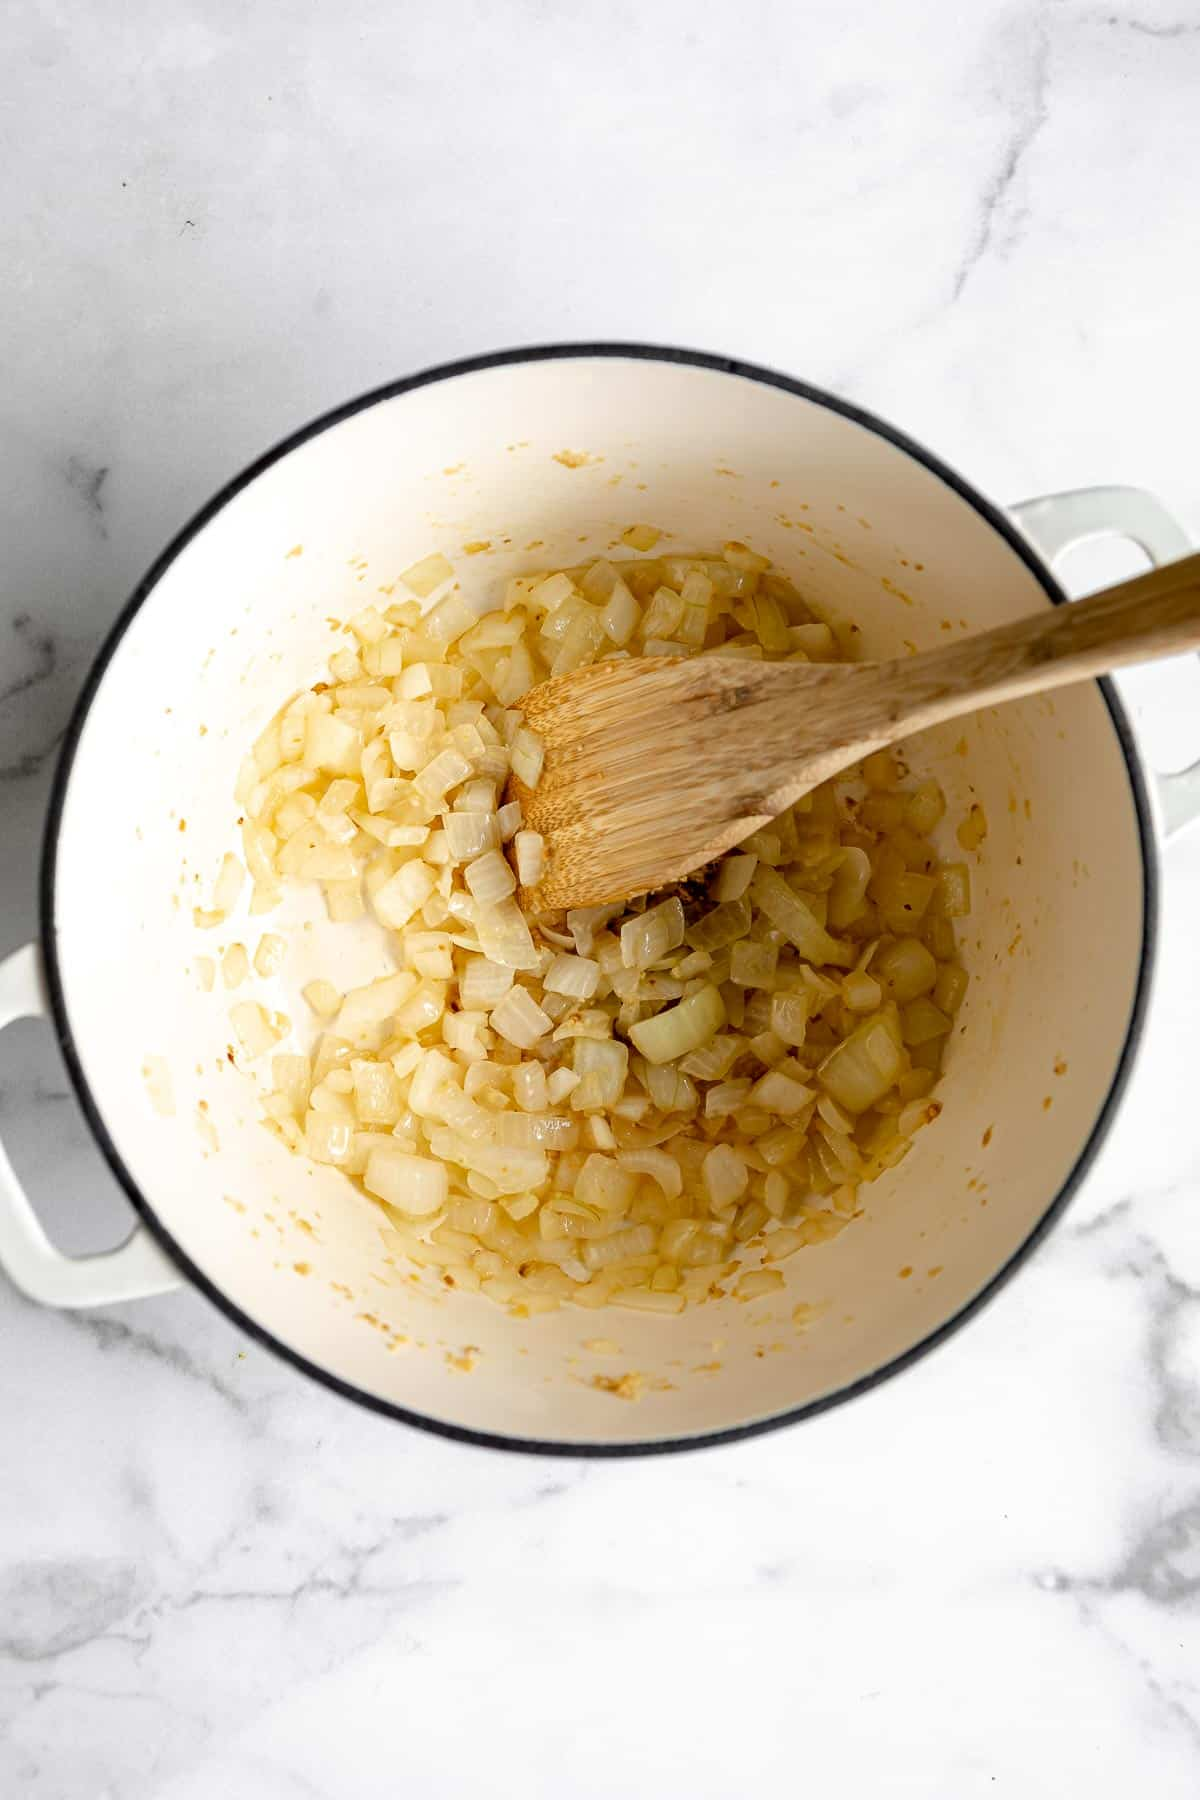 sauteeing onion and garlic